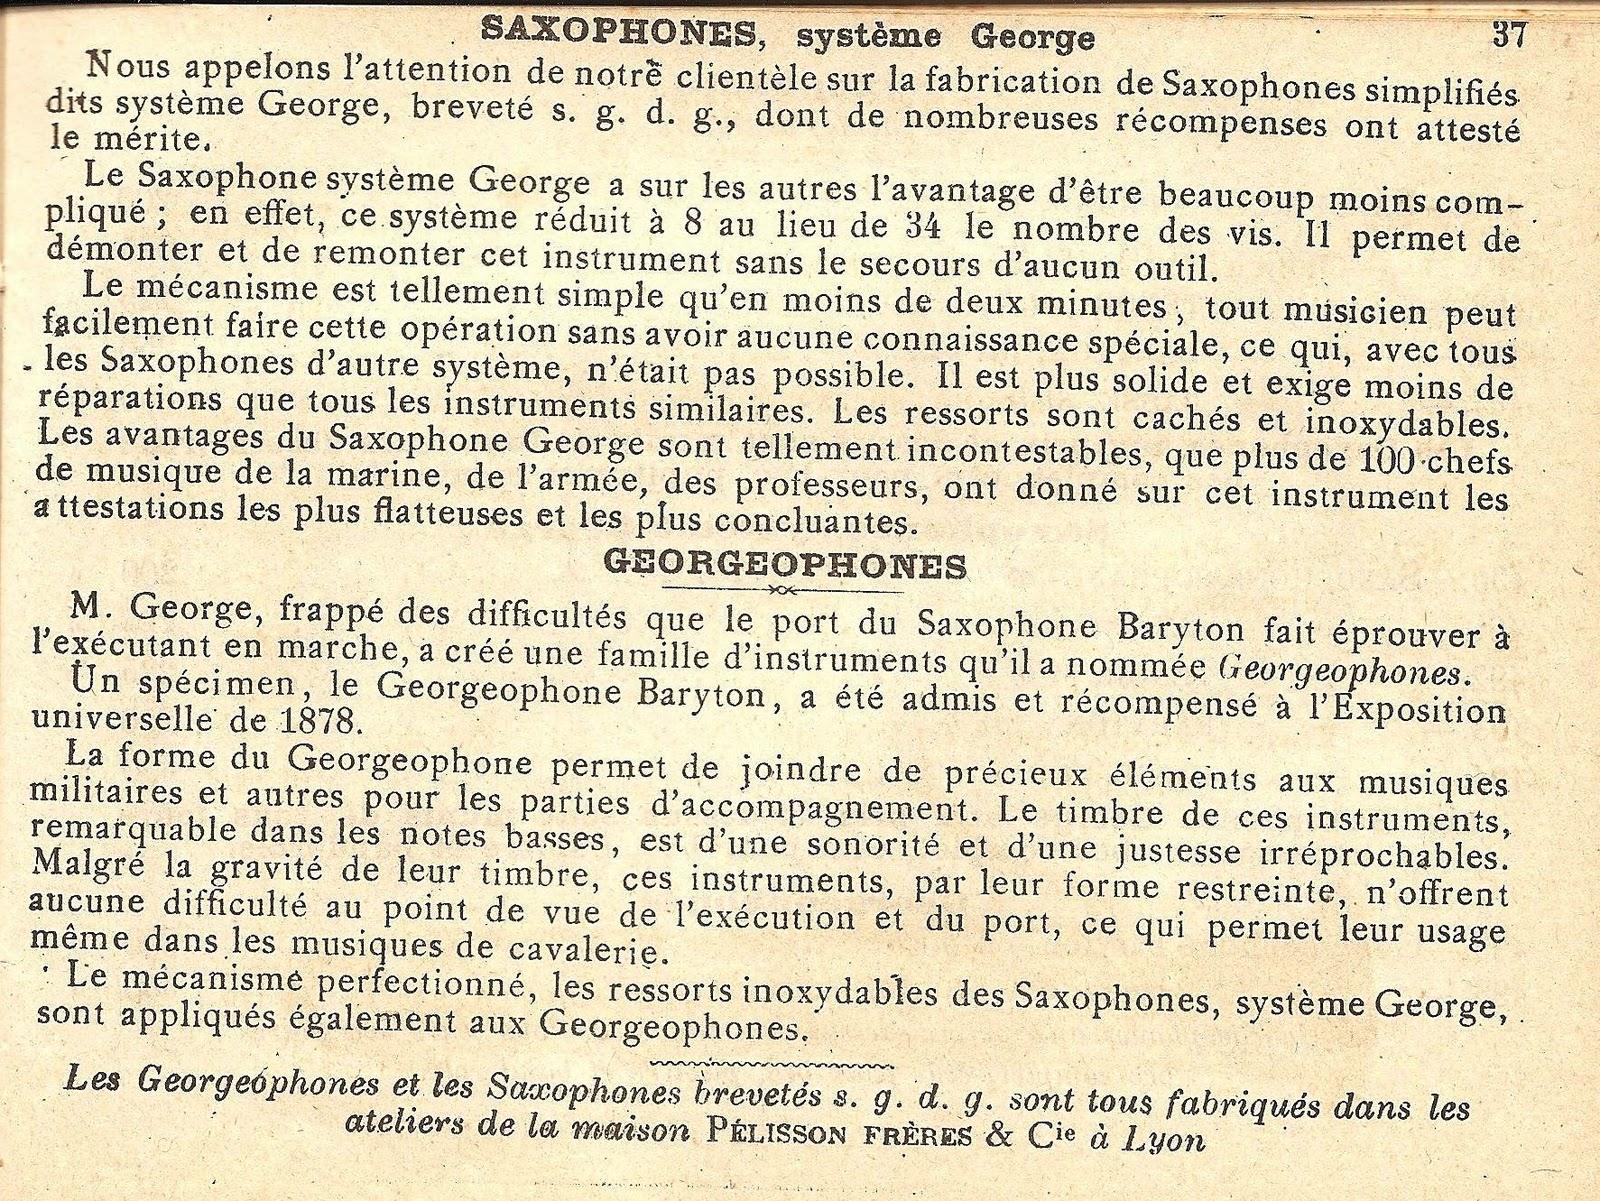 Adolphe Sax Patent